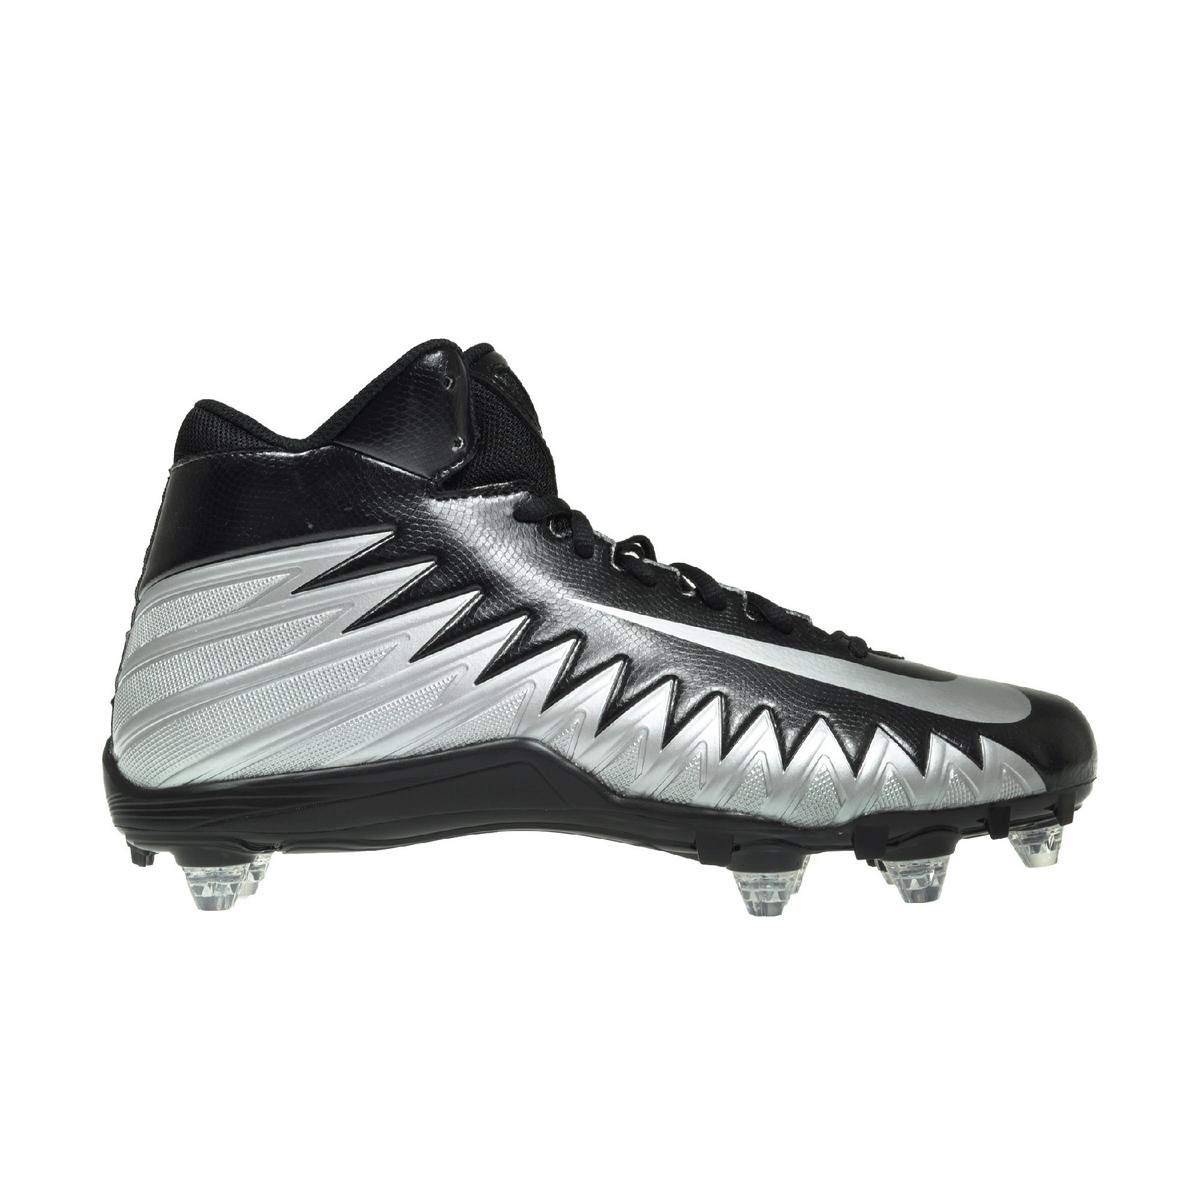 premium selection 5037d 6de27 Amazon.com  Nike Men s Alpha Menace Varsity Mid D Football Cleat  Black Metallic Silver White Size 9  Sports   Outdoors